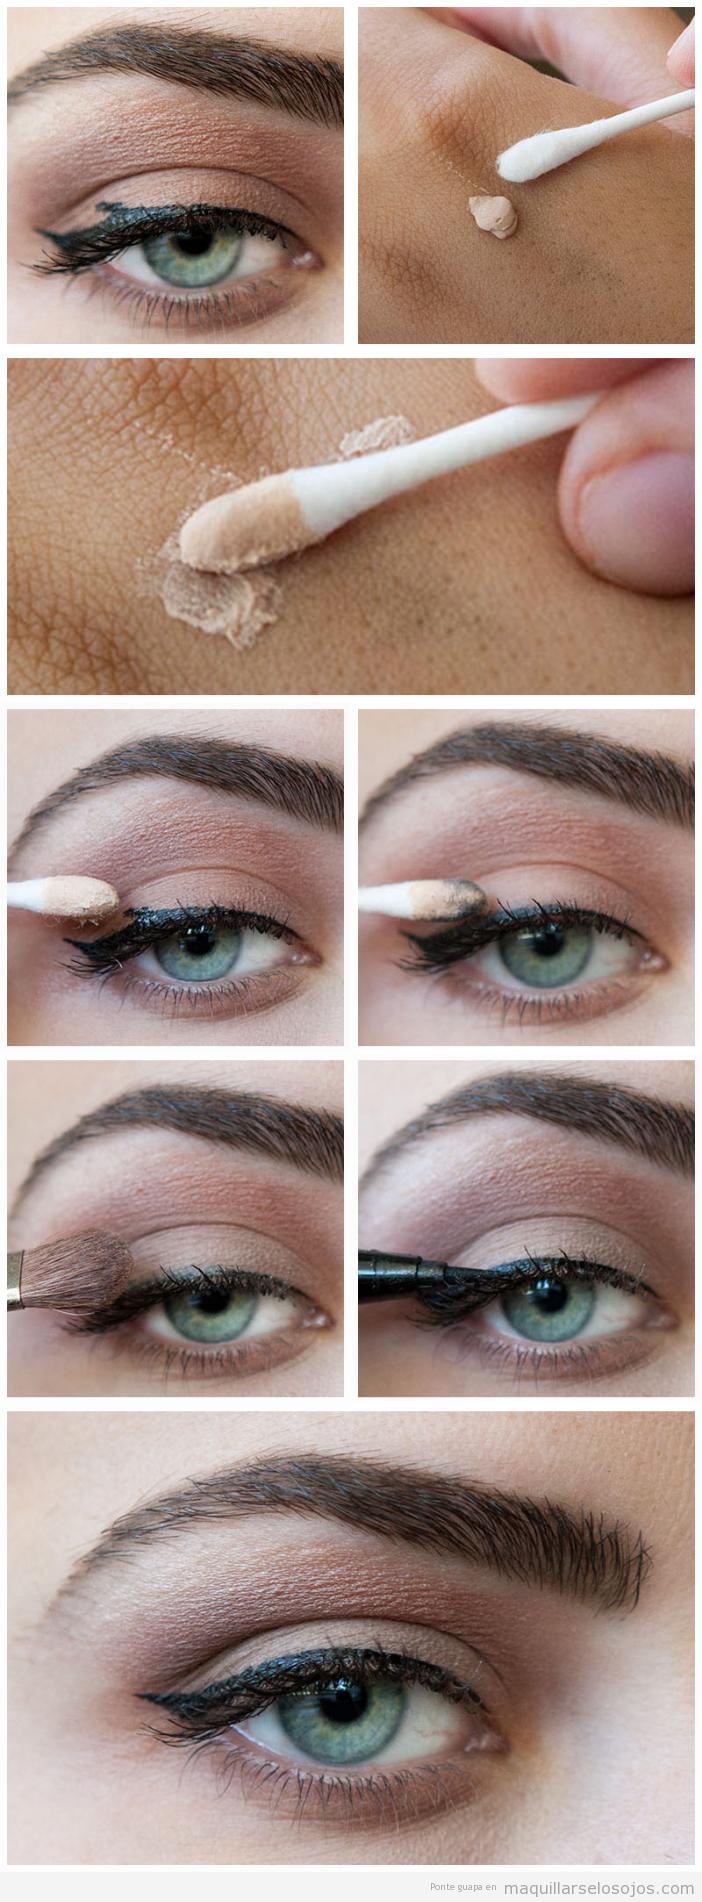 Truco arreglar errores maquillaje, tutorial paso a paso